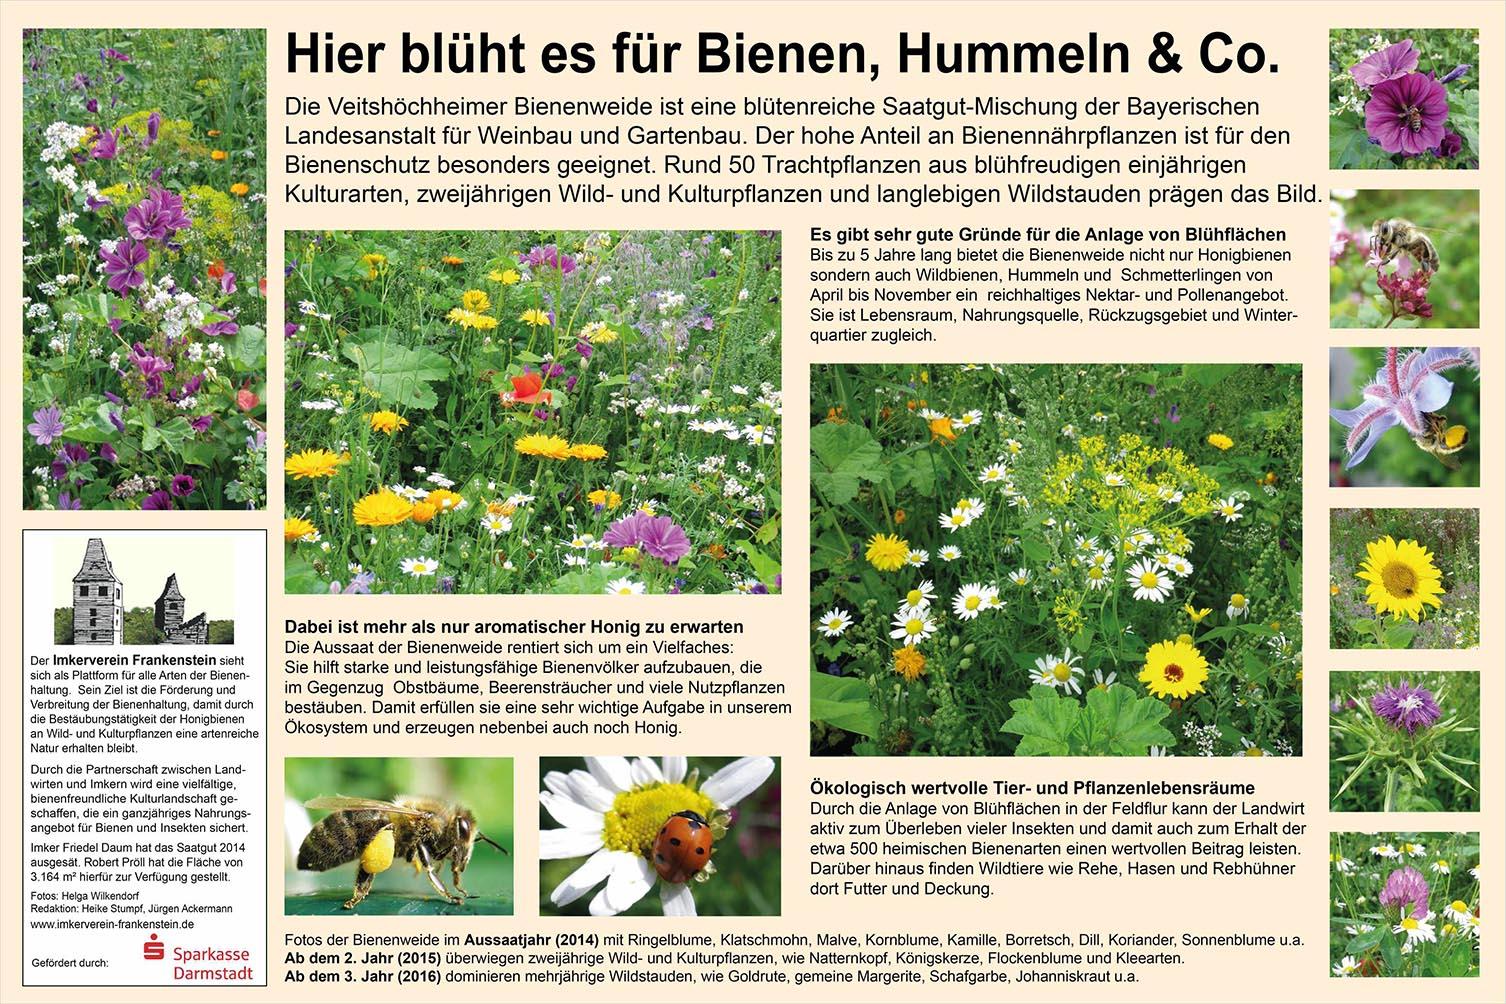 Bienenweide OB reduziert